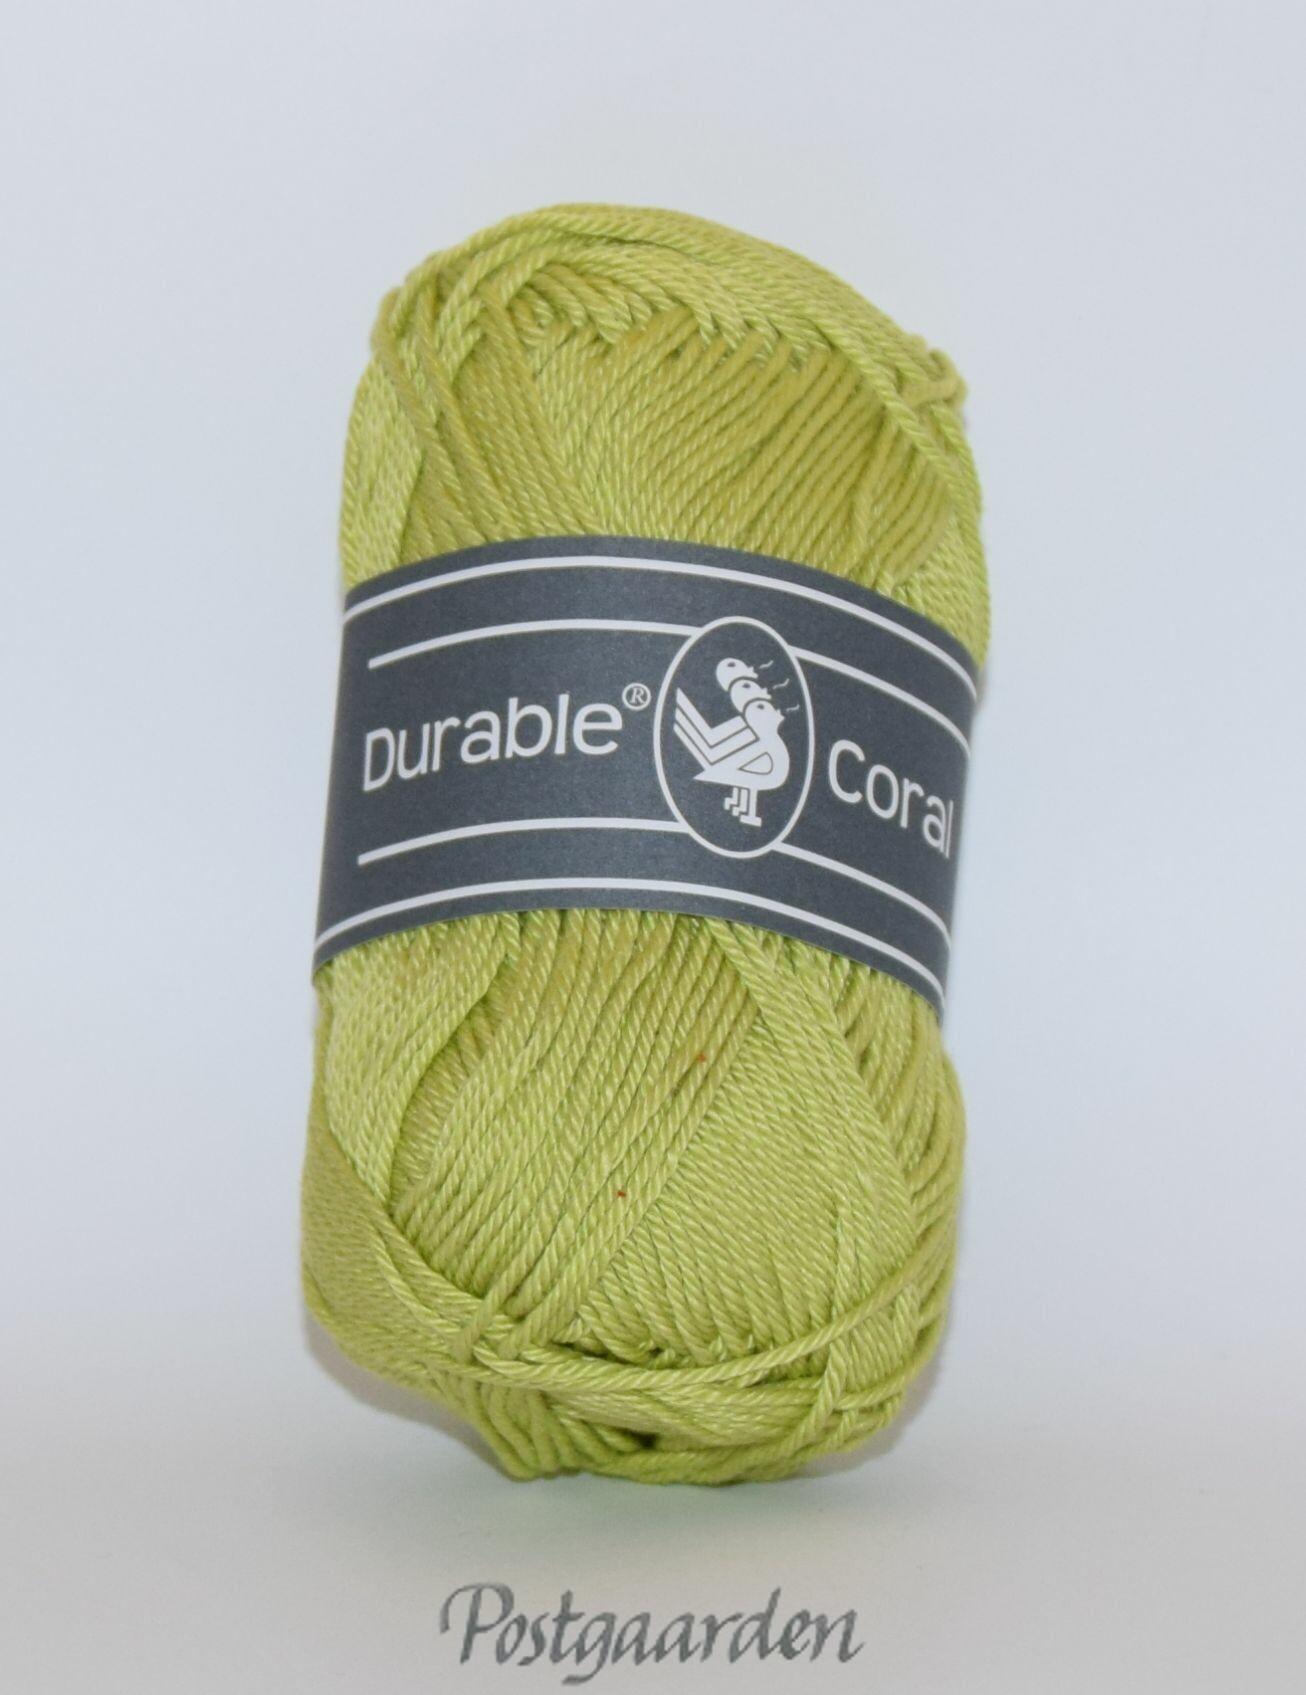 352 - Lime Durable Coral bomuldsgarn